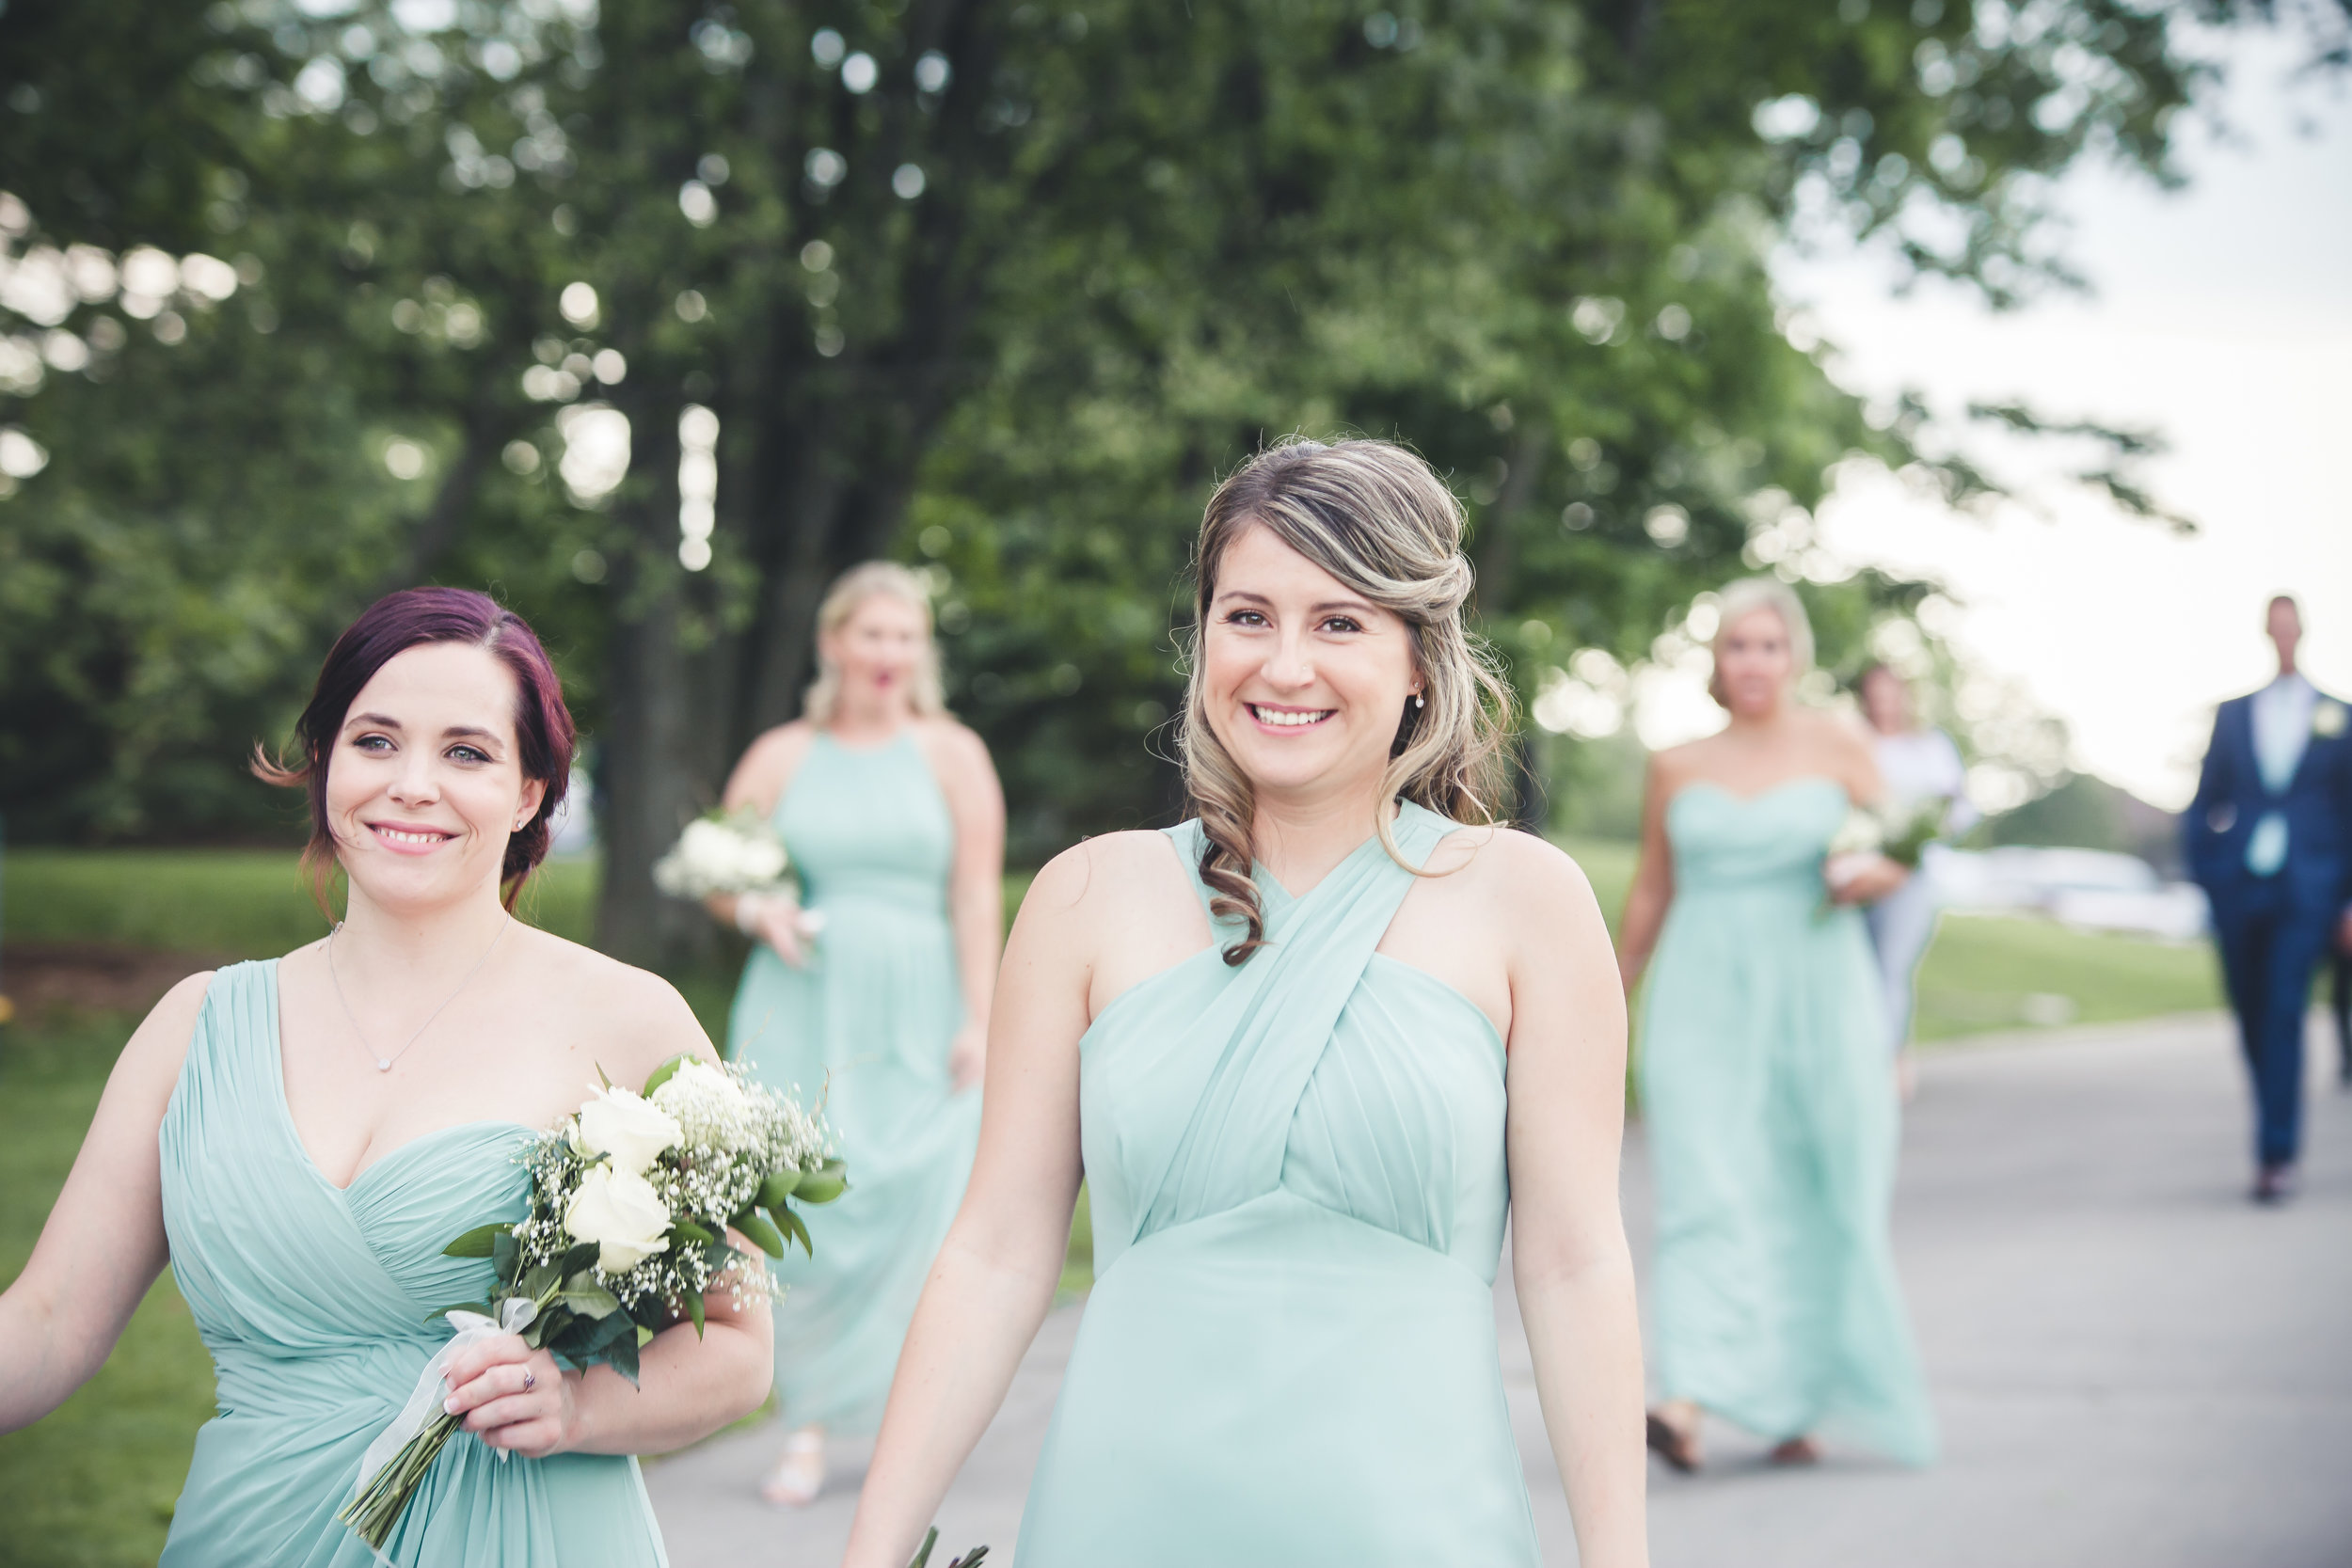 Amy D Photography Barrie and Muskoka Wedding Photography Barrie Country Club Getting Ready-4.jpg